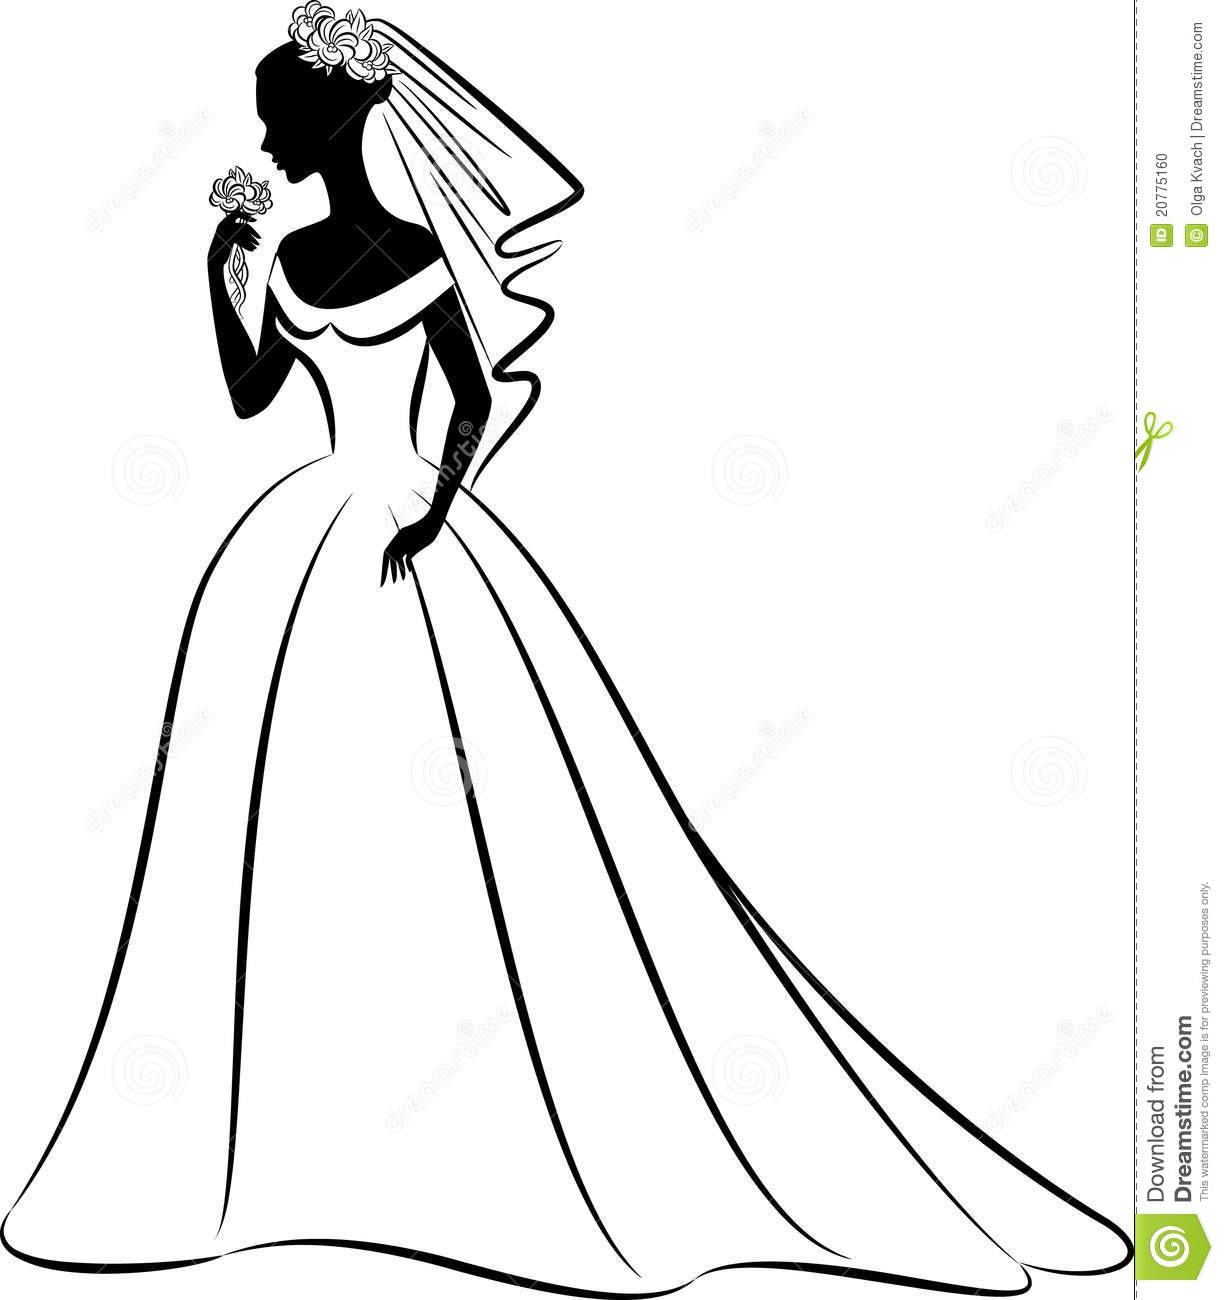 Dress Outline Clipart - Clipart Kid